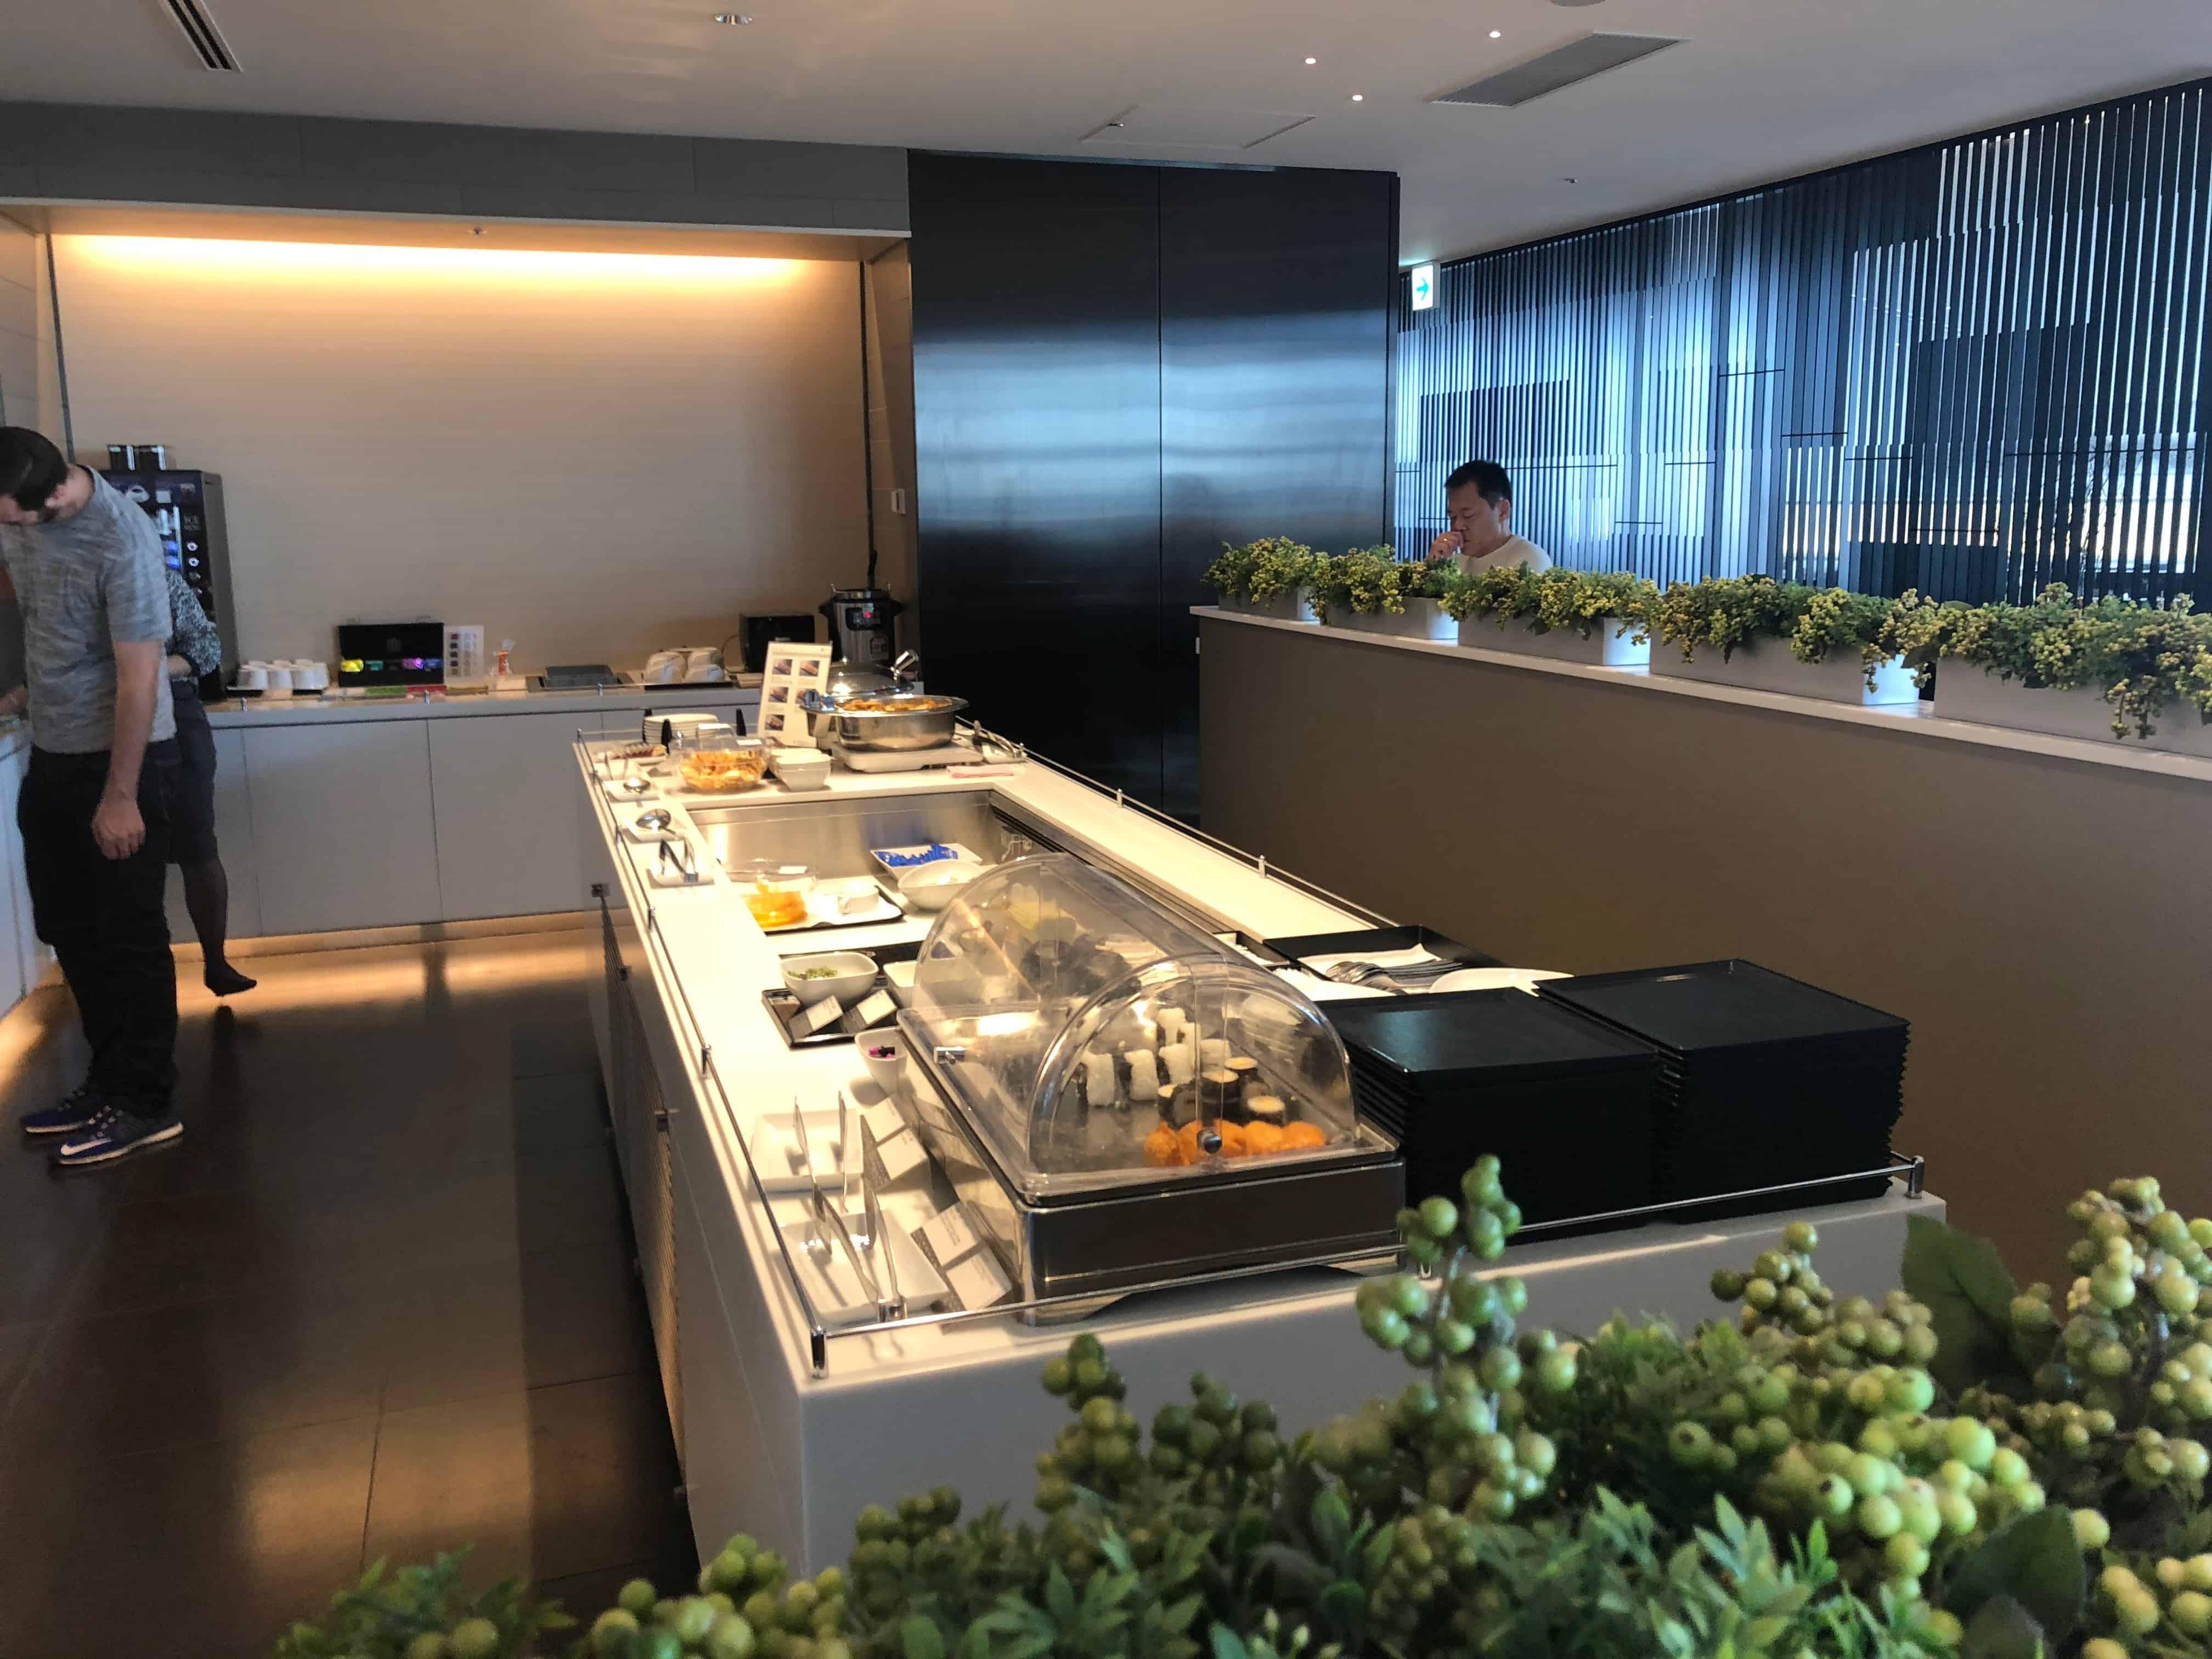 ANA Economy Bewertung Lounge kaltes Buffet